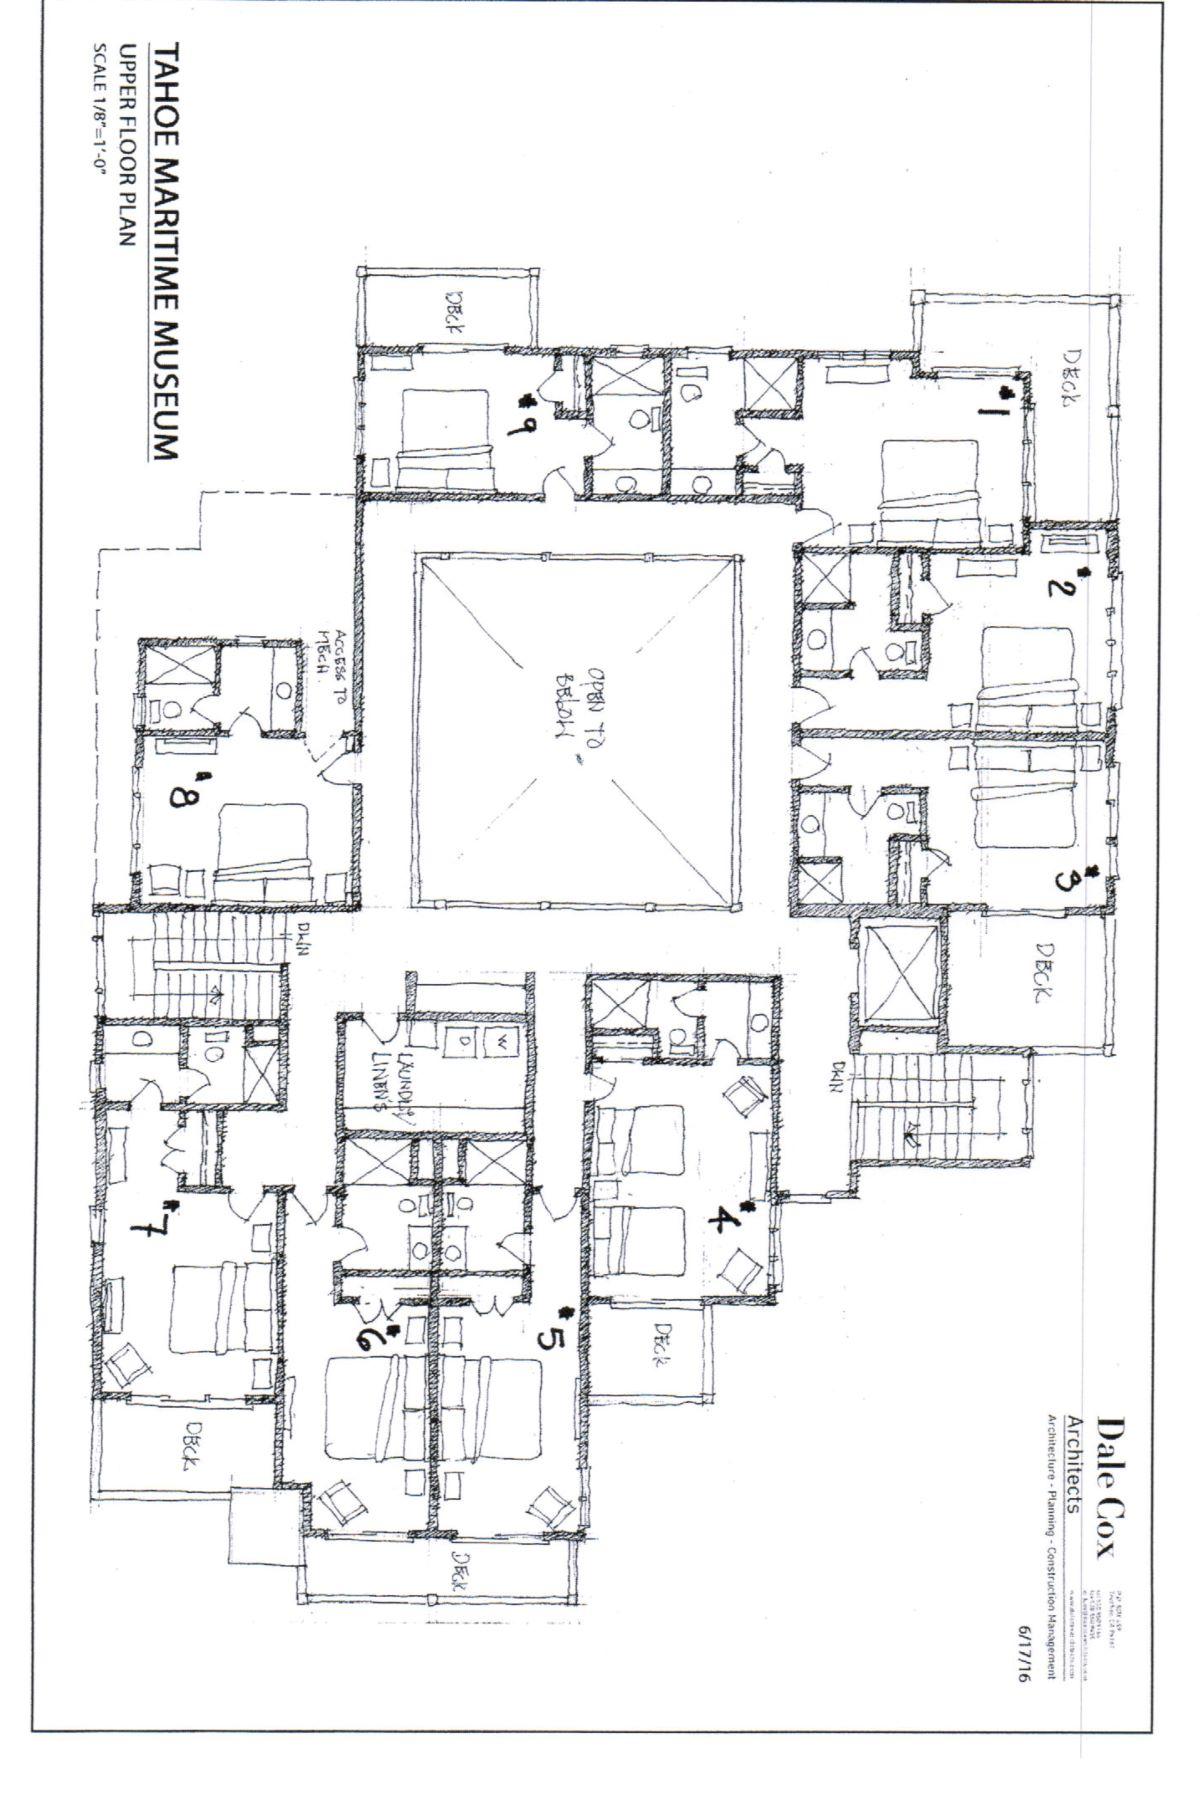 Additional photo for property listing at 5205 West Lake Boulevard, Homewood, CA 5205 West Lake Boulevard Homewood, California 96141 United States